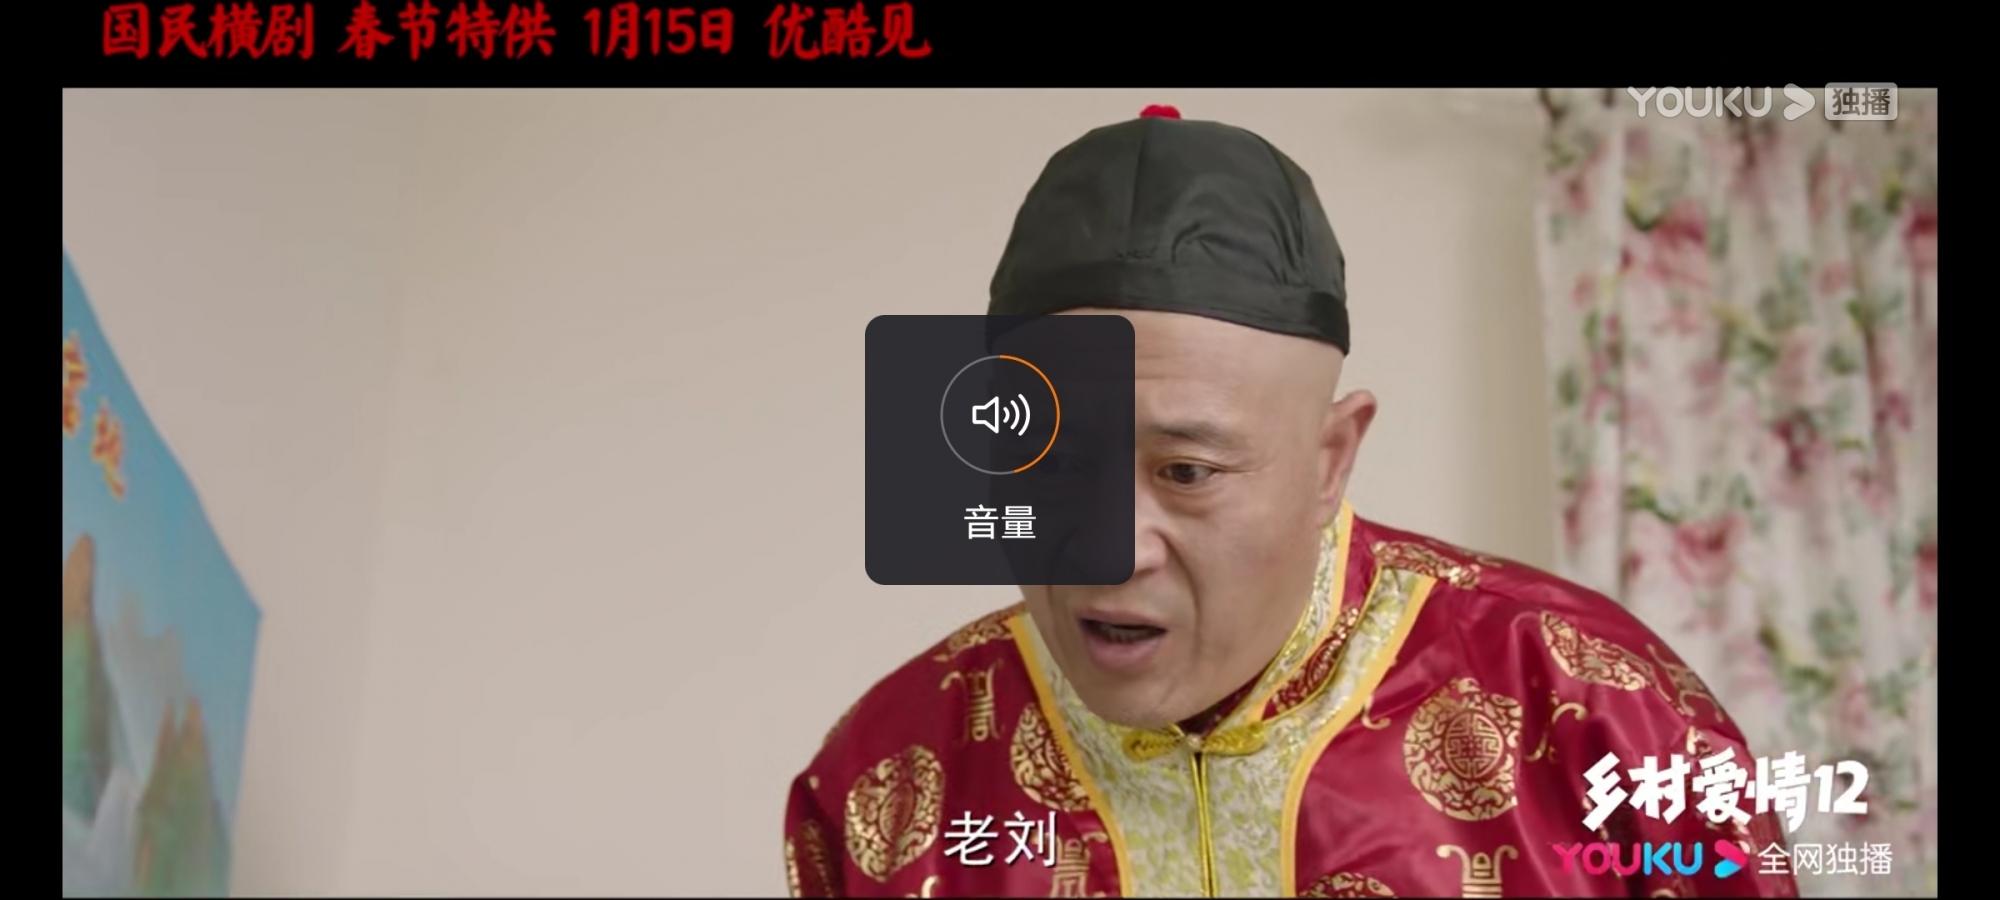 Screenshot_20200114_183651_com.huawei.himovie.jpg